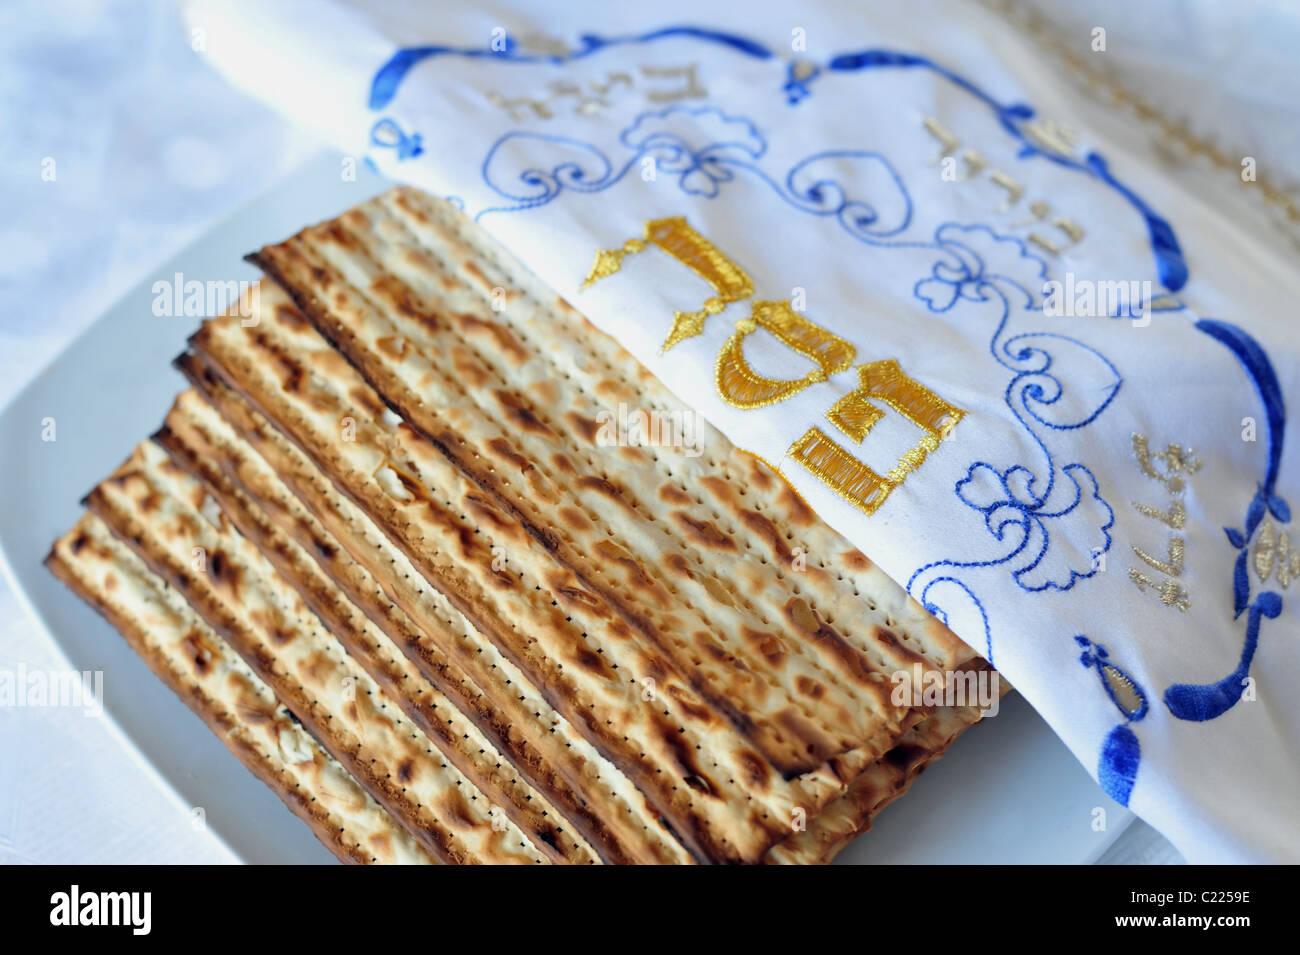 Jewish Holidays - Passover - Pesach - Seder - Matzo -Matzah - Stock Image